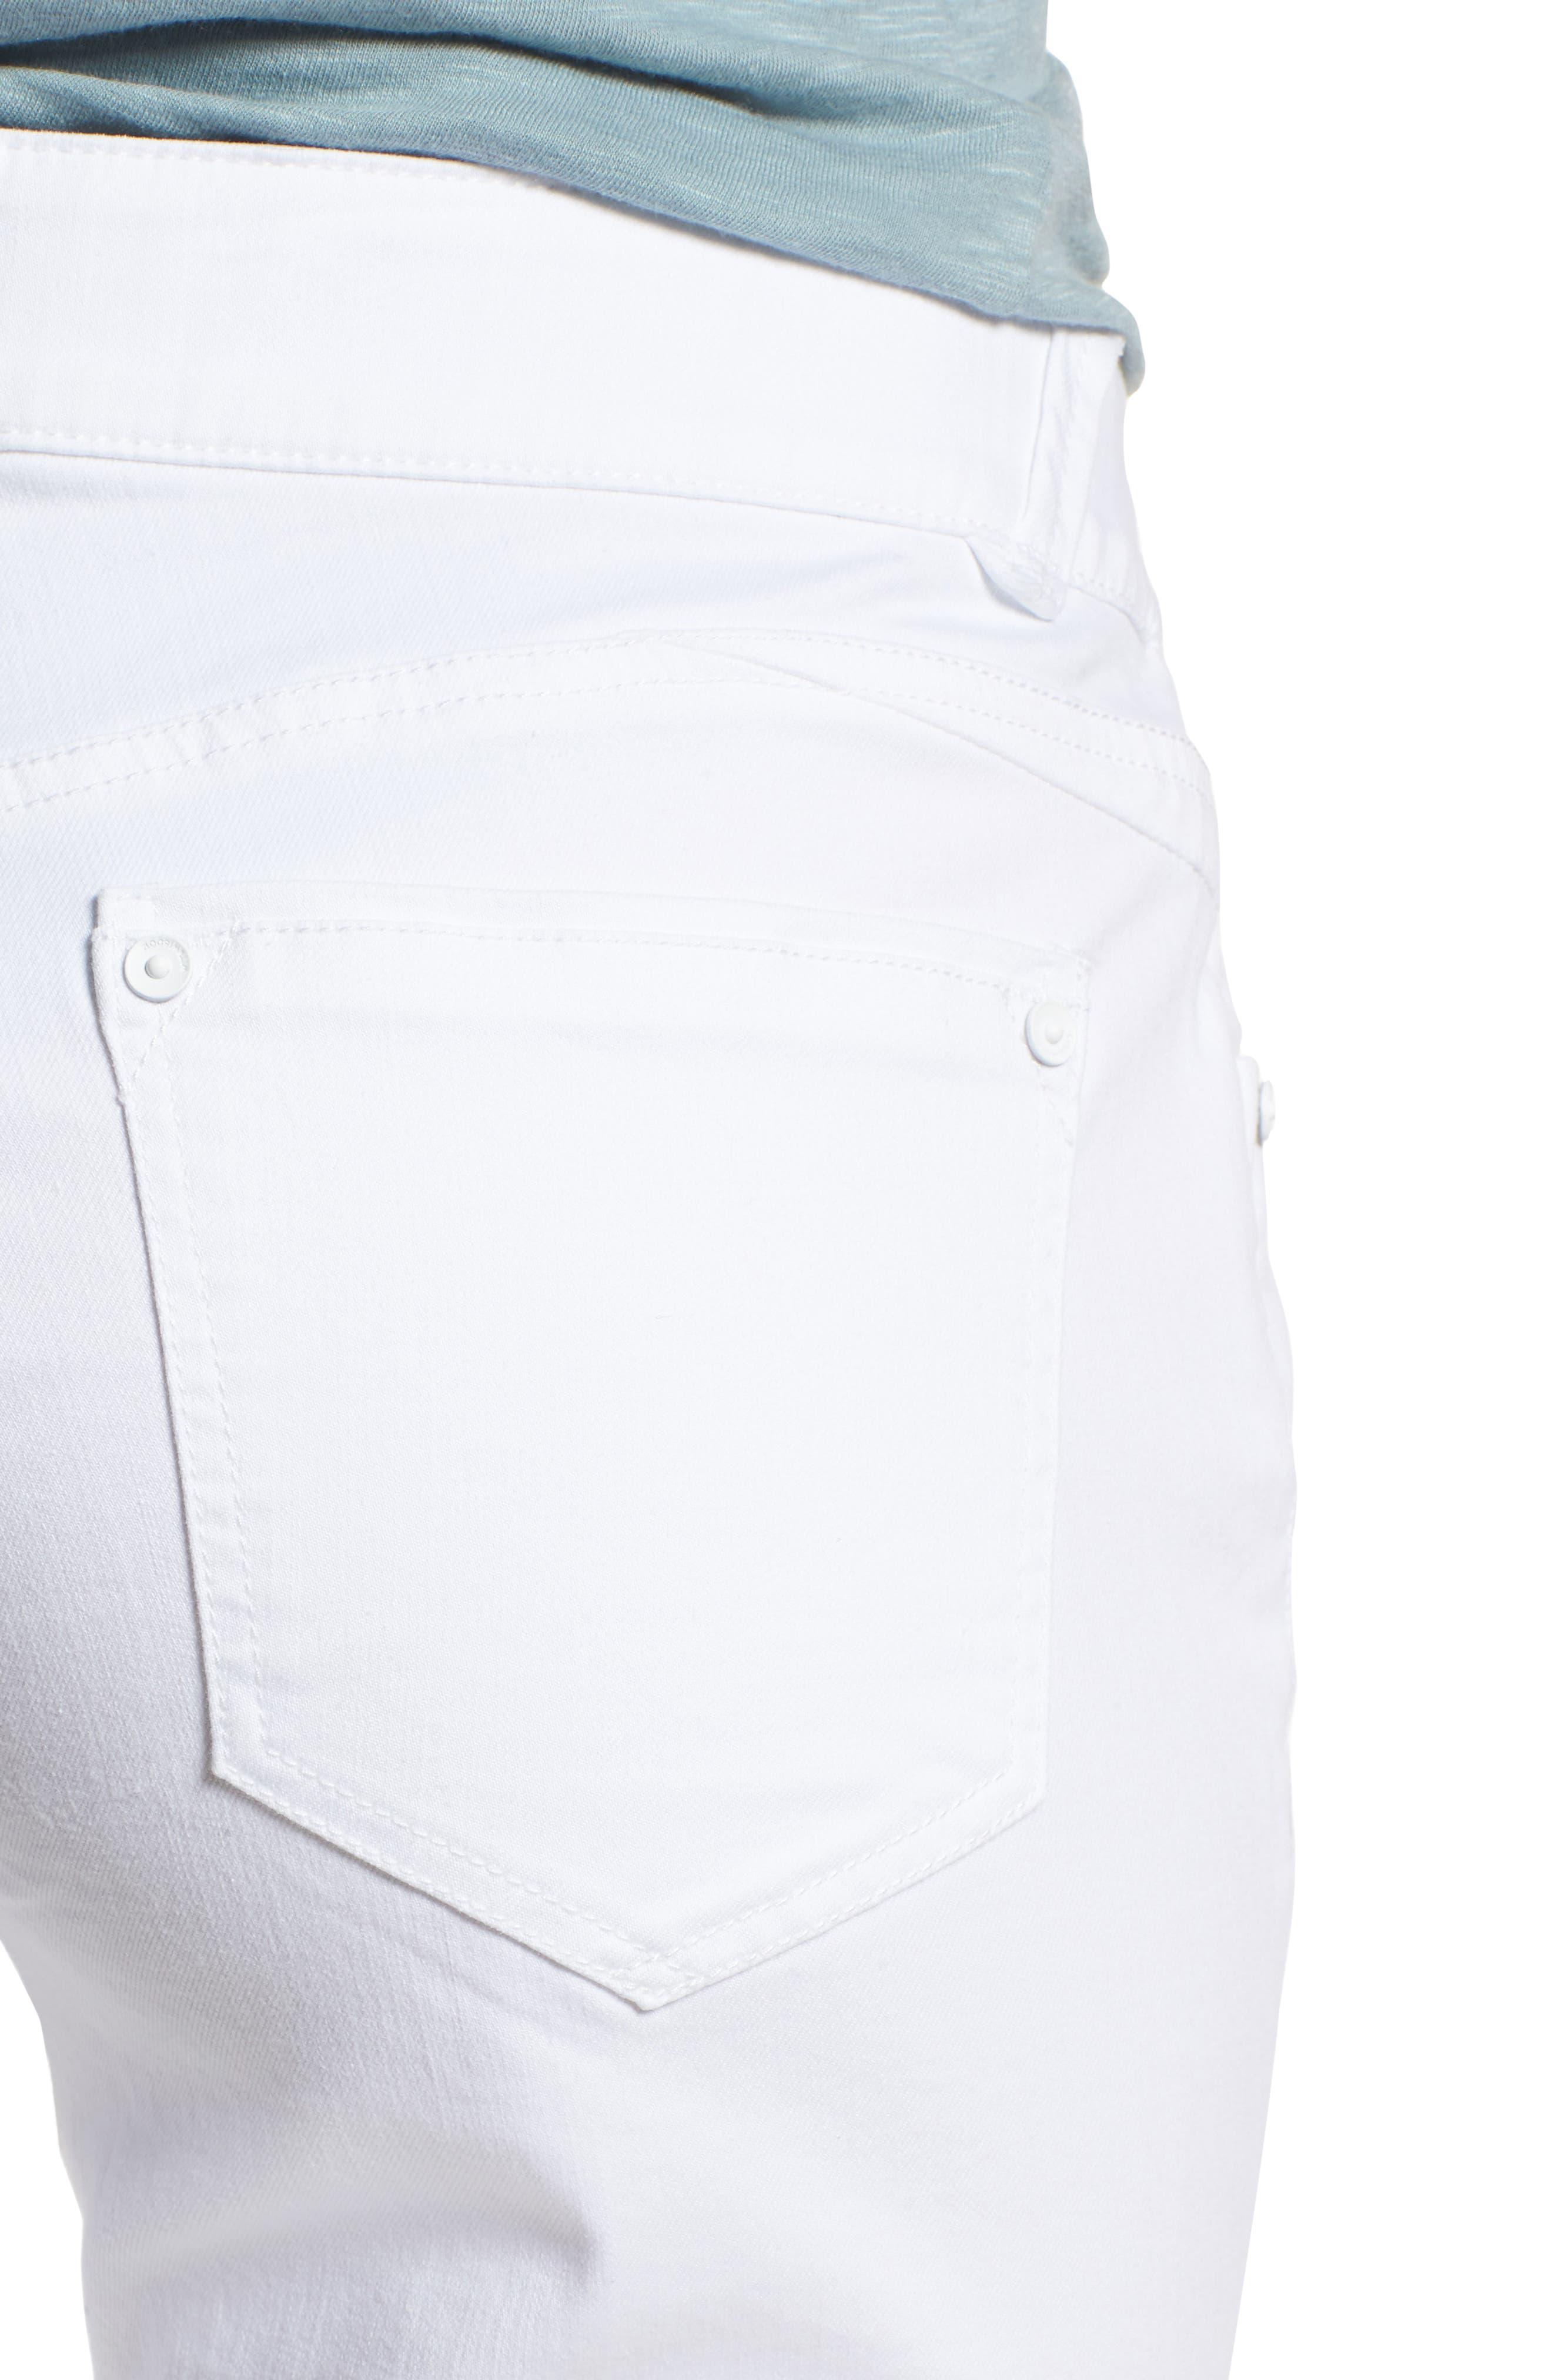 Ab-solution White Bermuda Shorts,                             Alternate thumbnail 4, color,                             OPTIC WHITE